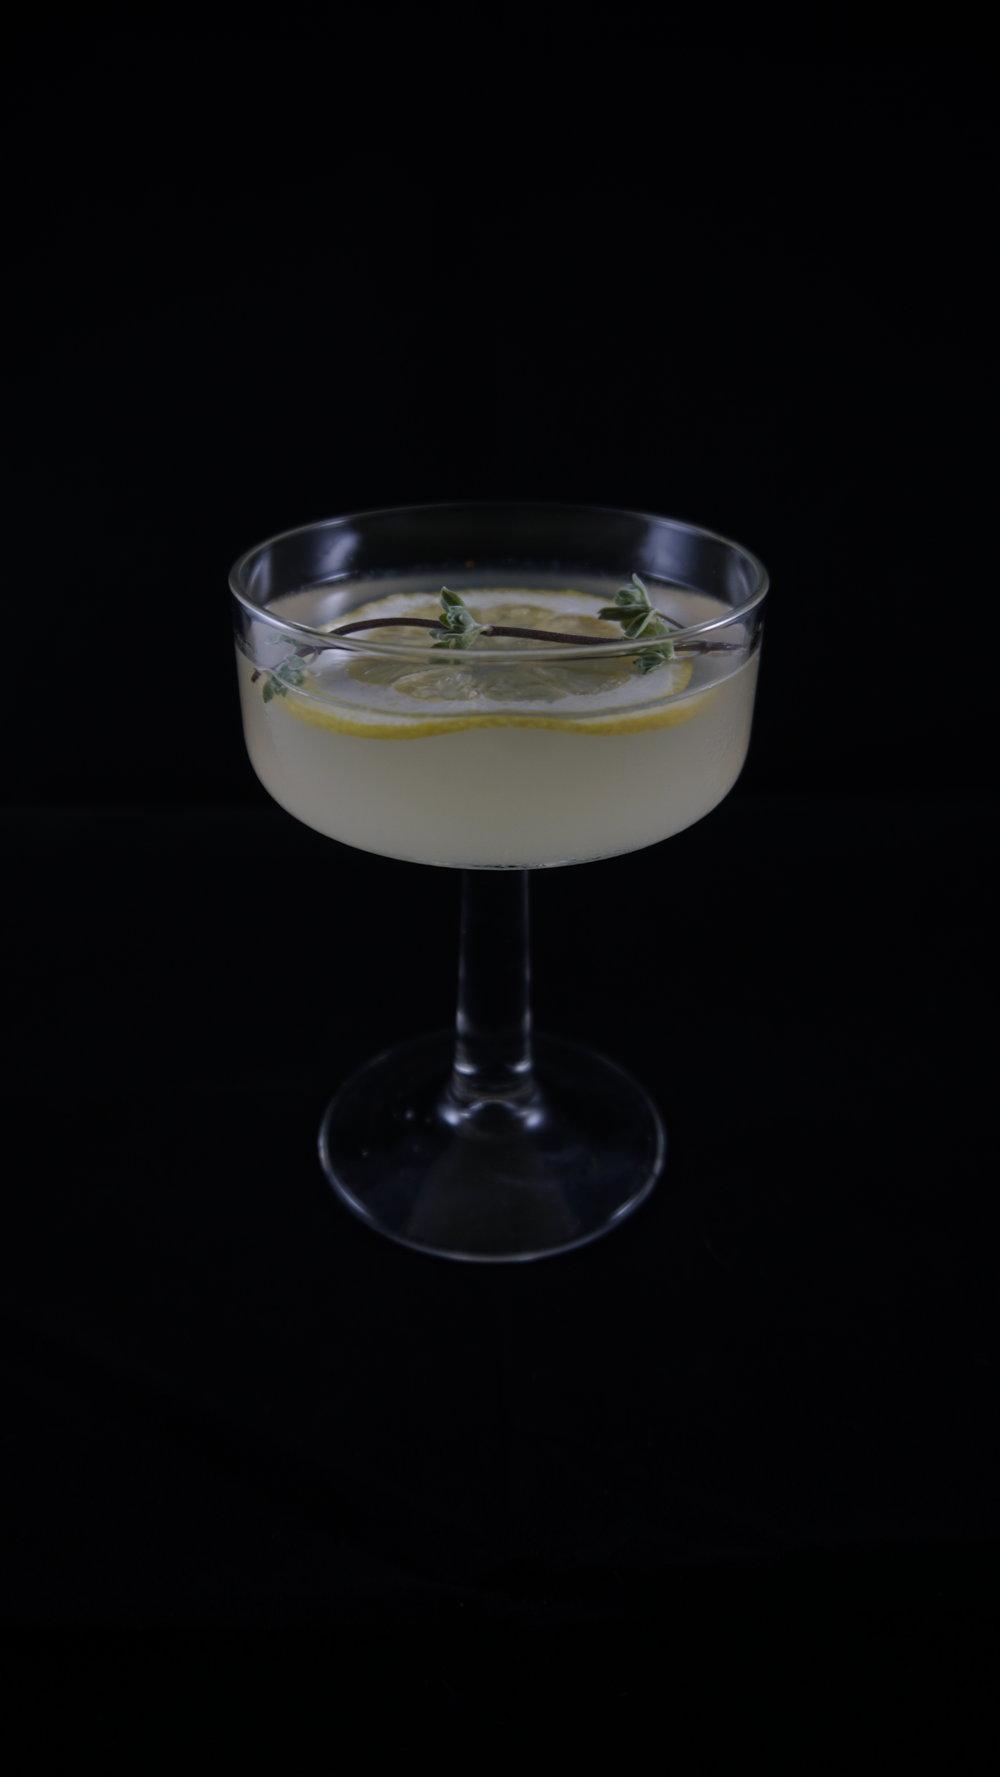 Suspiria (1977) - .75 oz Sambuco.75 oz Lillet blanc.75 oz Elderflower liquor.75 oz Lemon juiceDash of ginLemon twist for garnishCombine all liquids in a shaker with ice. Strain and pour in tall glass. Add lemon twist for garnish.For extra botanicals on the nose, add a sprig of fresh herbs (here we used fresh marjoram).